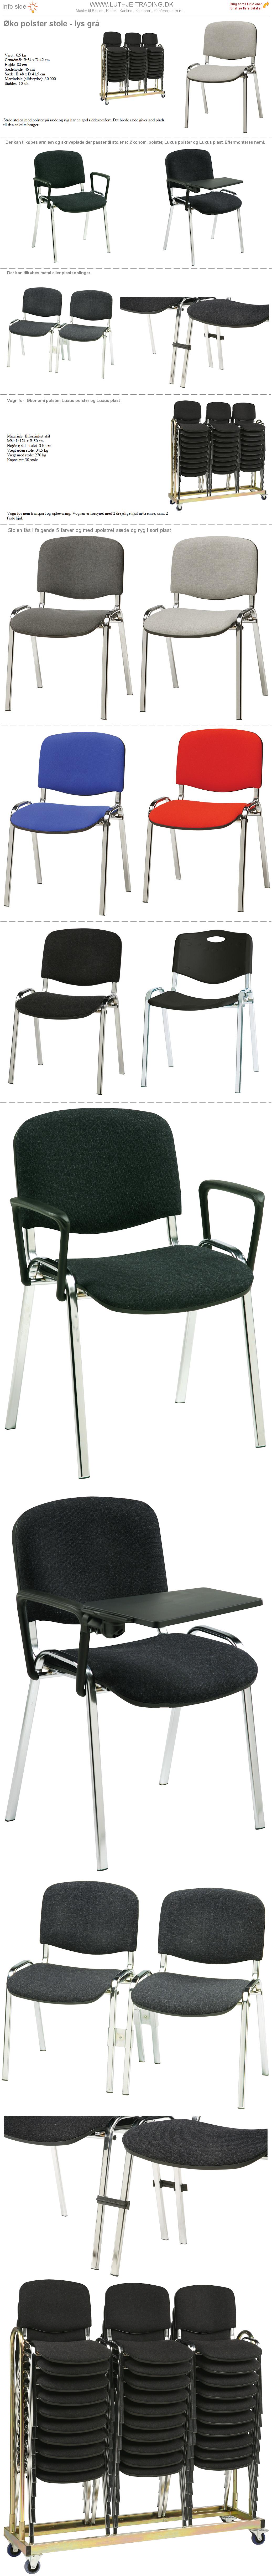 Plaststole Øko polster lys grå